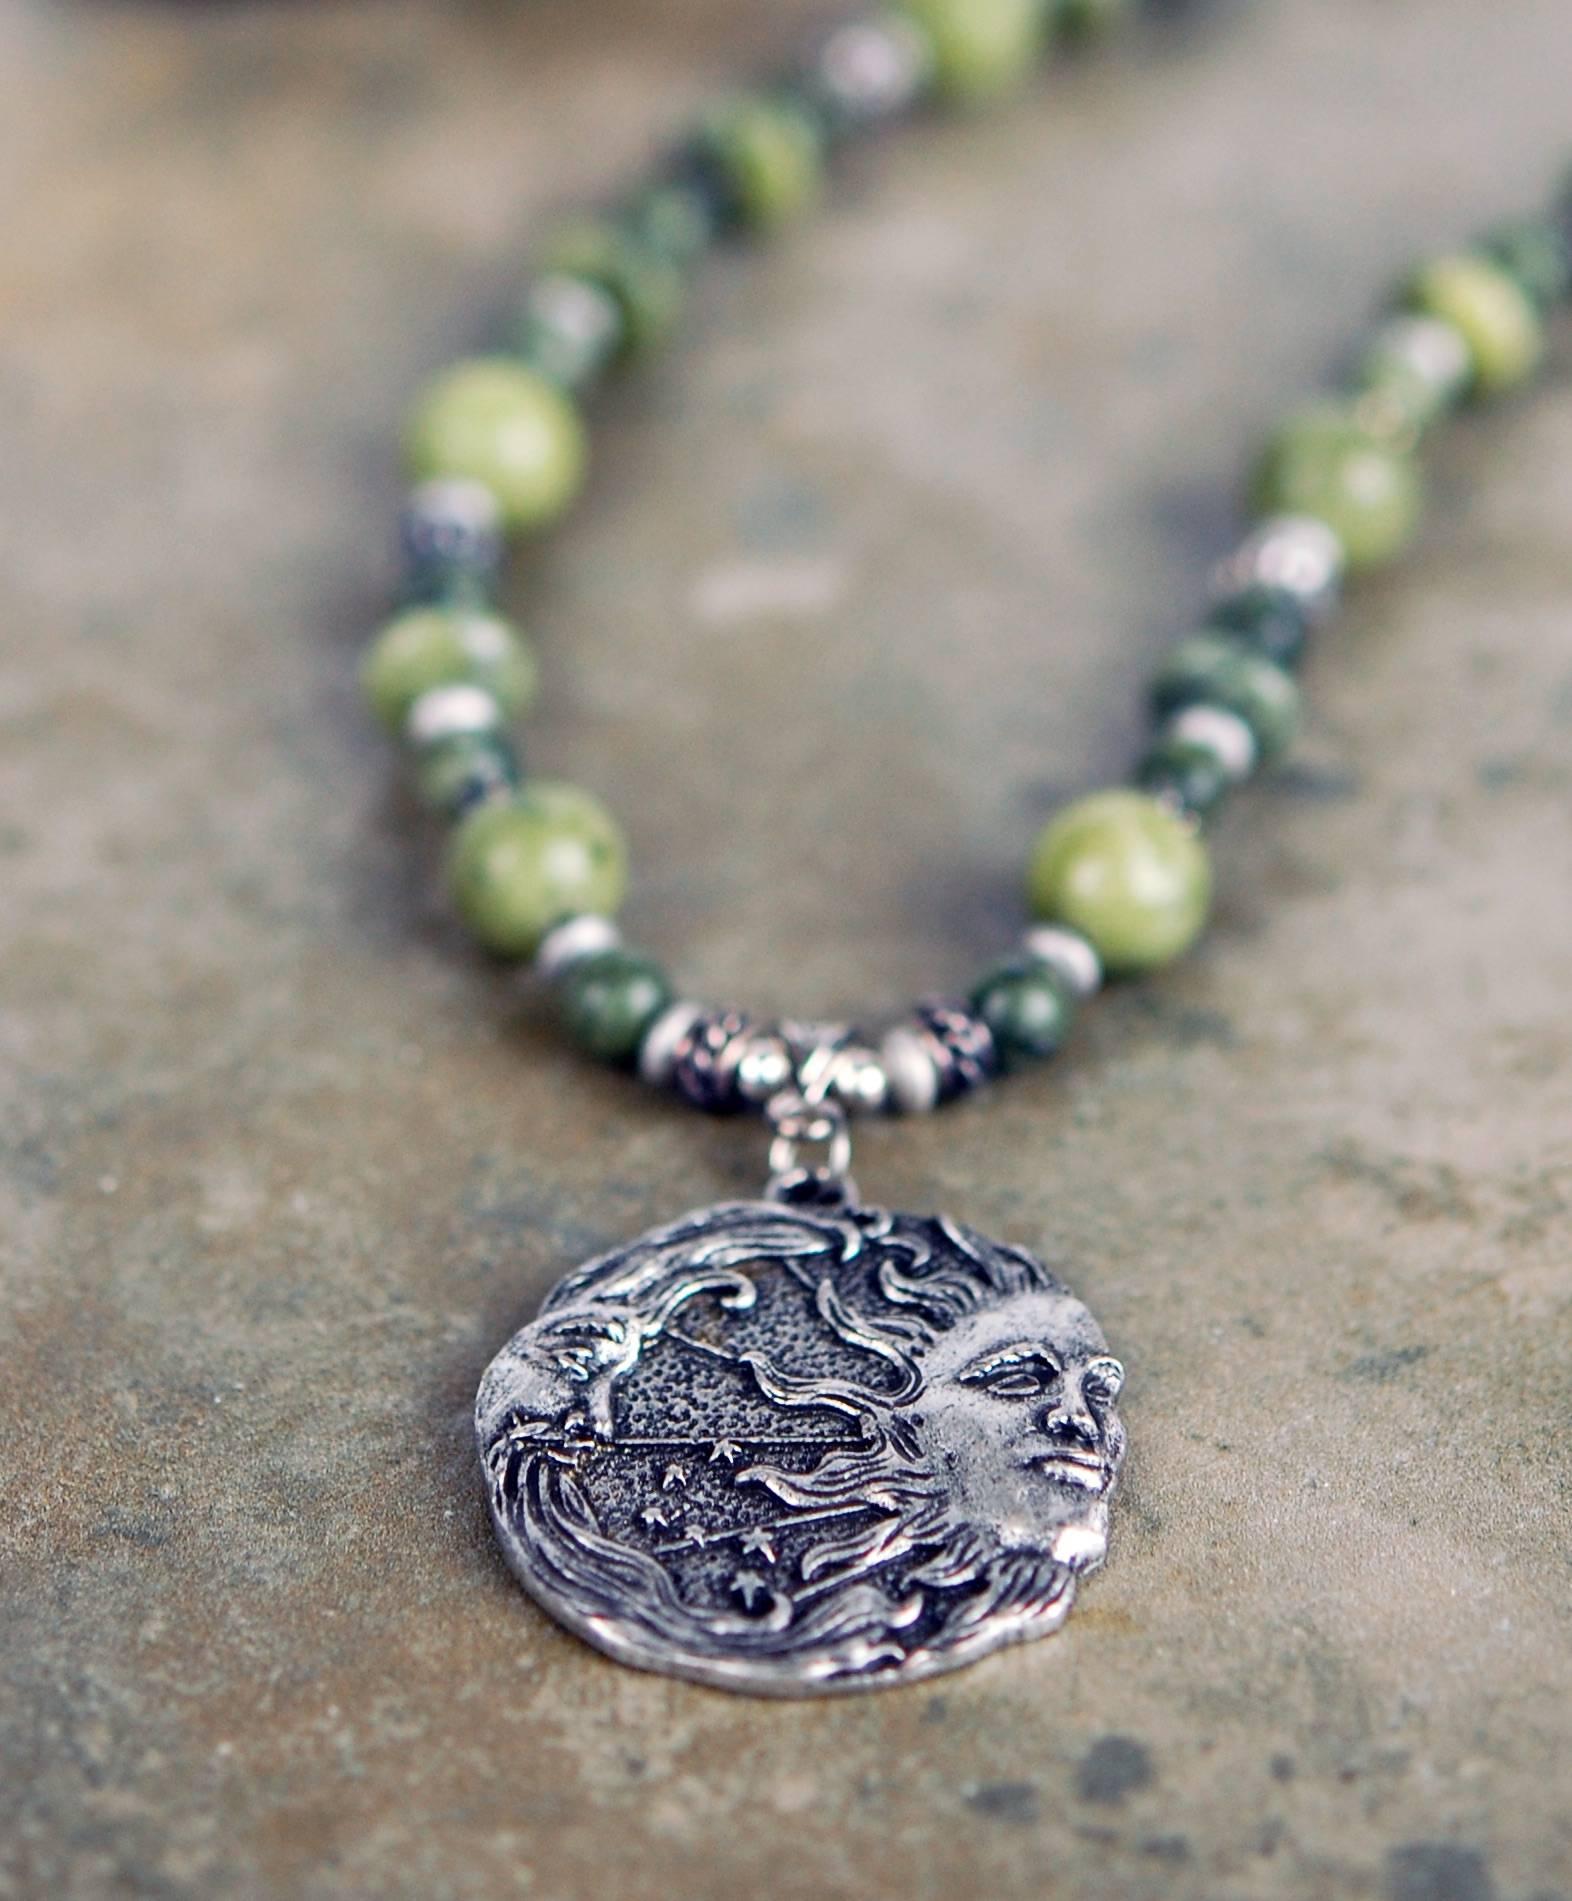 Connemara Marble with Mystic Moon and Sun Focal